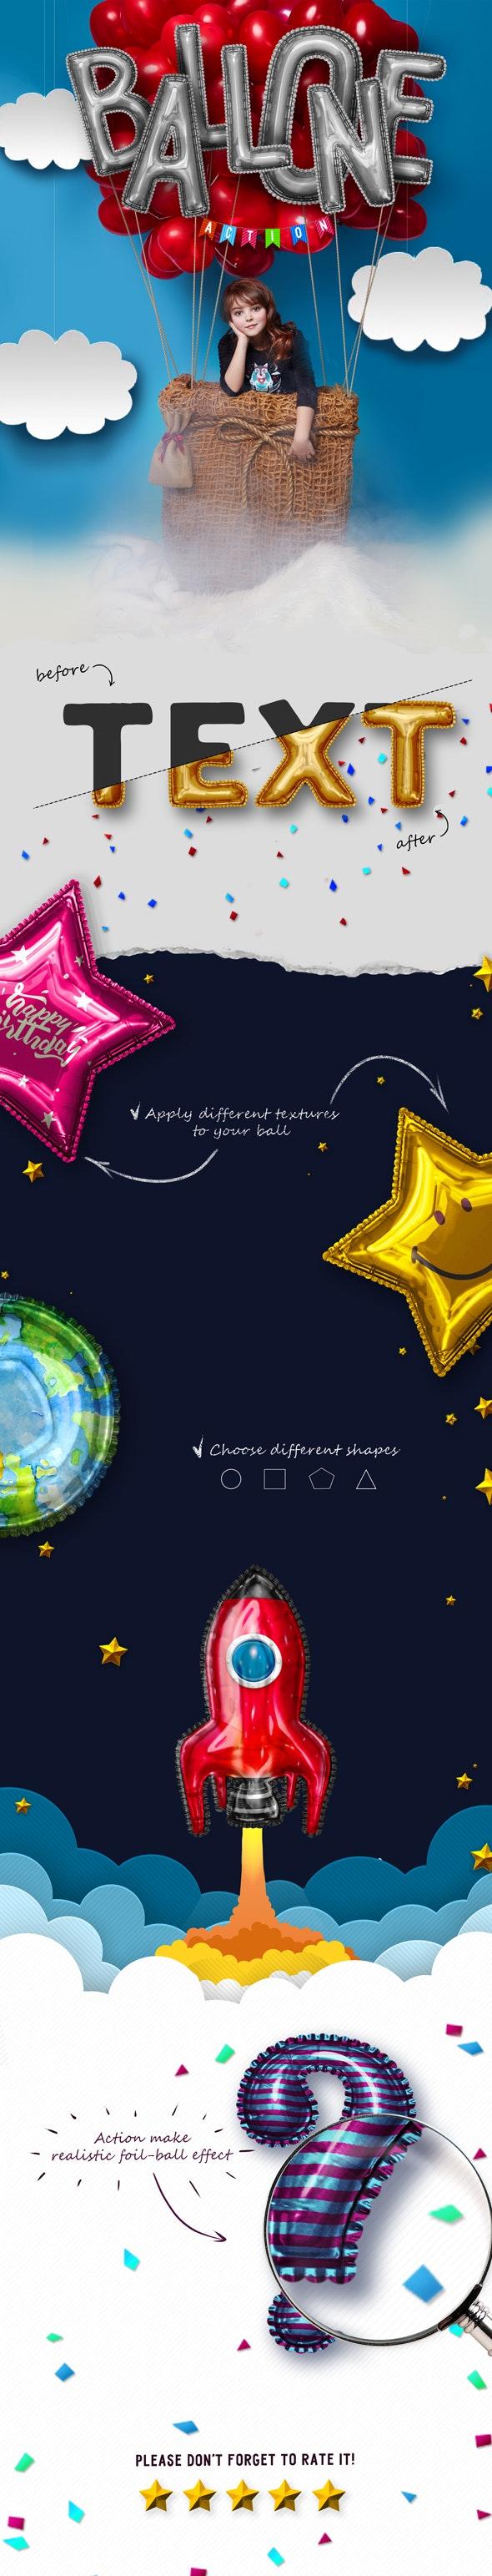 Balloon Photoshop Action - Utilities Actions